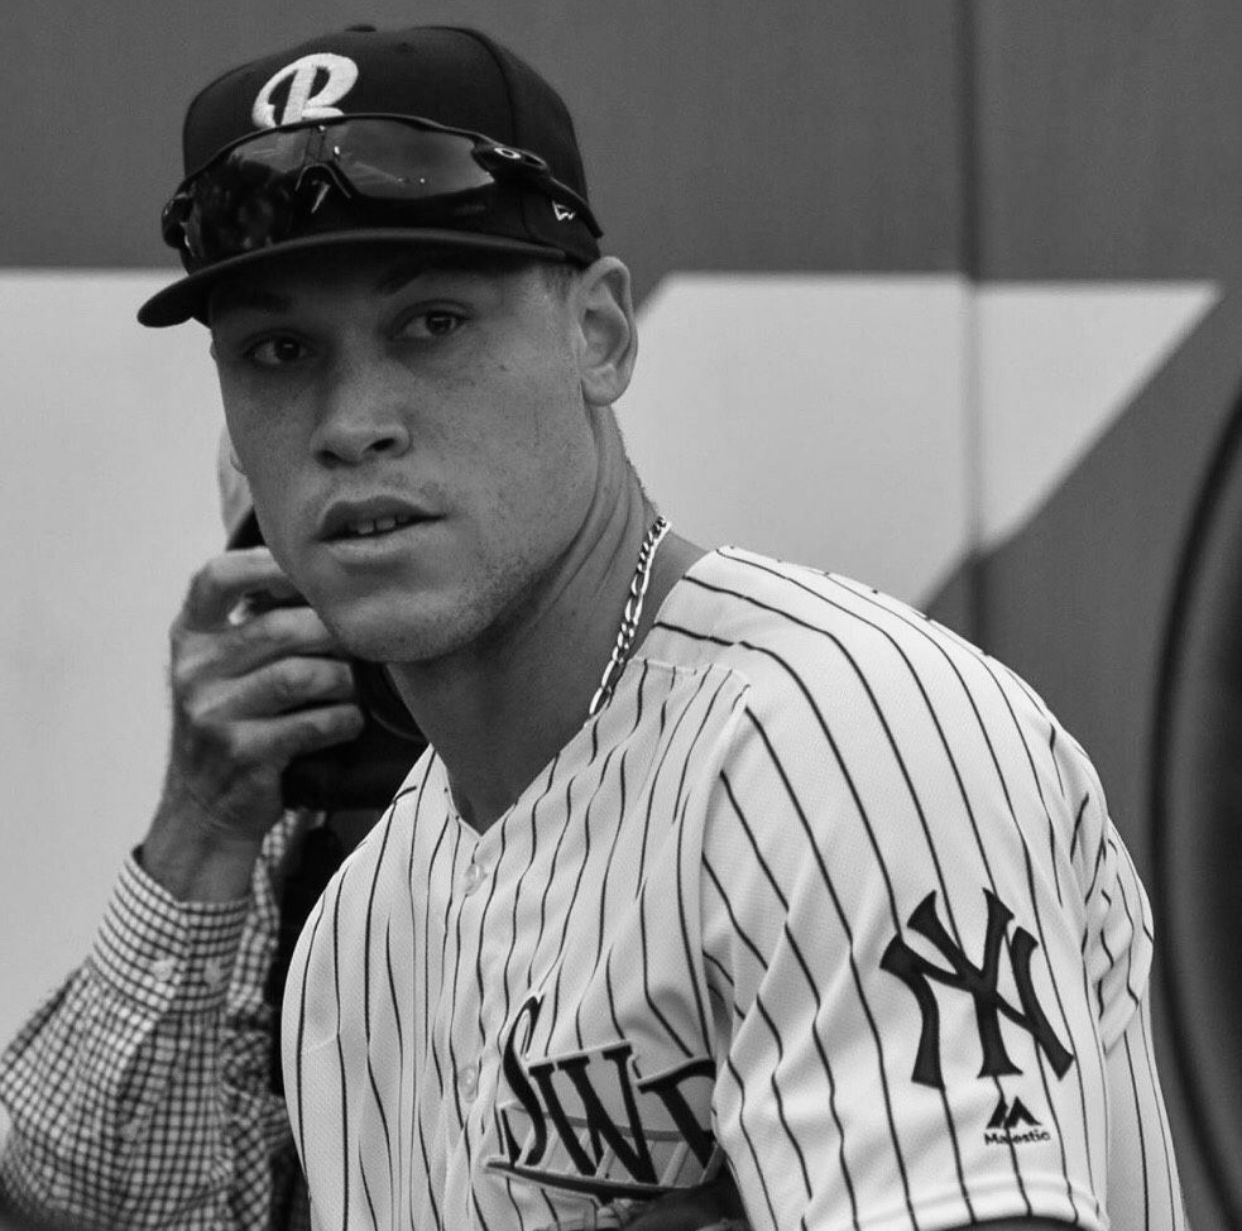 Pin By Rachel On Aaron Judge Ny Yankees New York Yankees Yankees Baseball